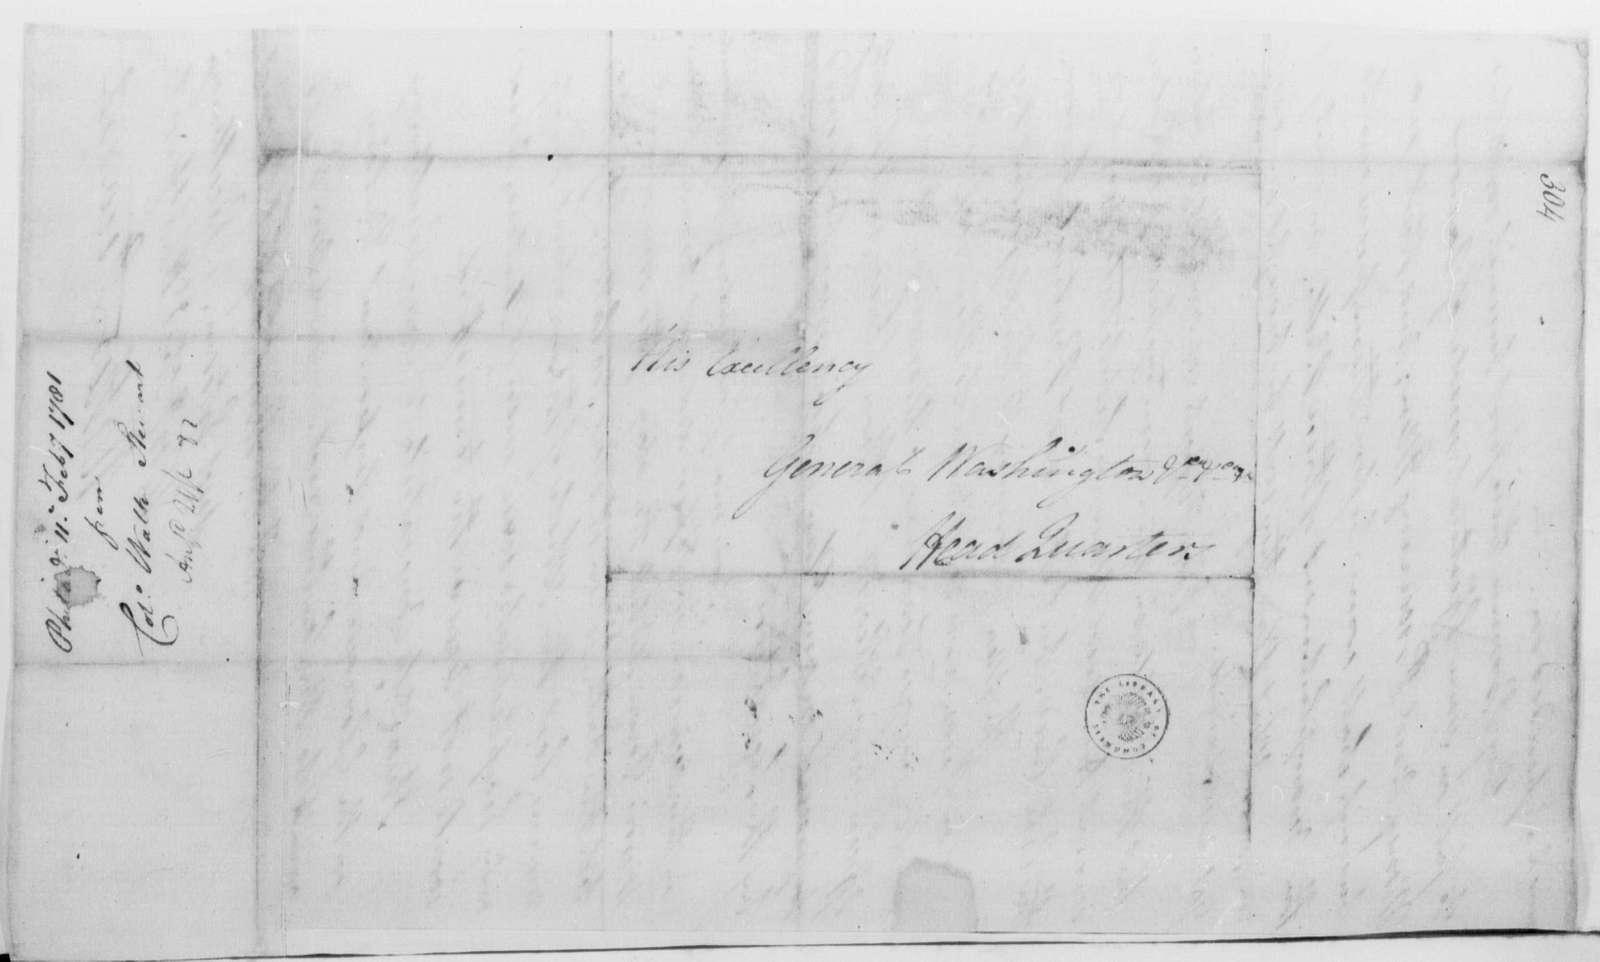 George Washington Papers, Series 4, General Correspondence: Walter Stewart to George Washington, February 11, 1781